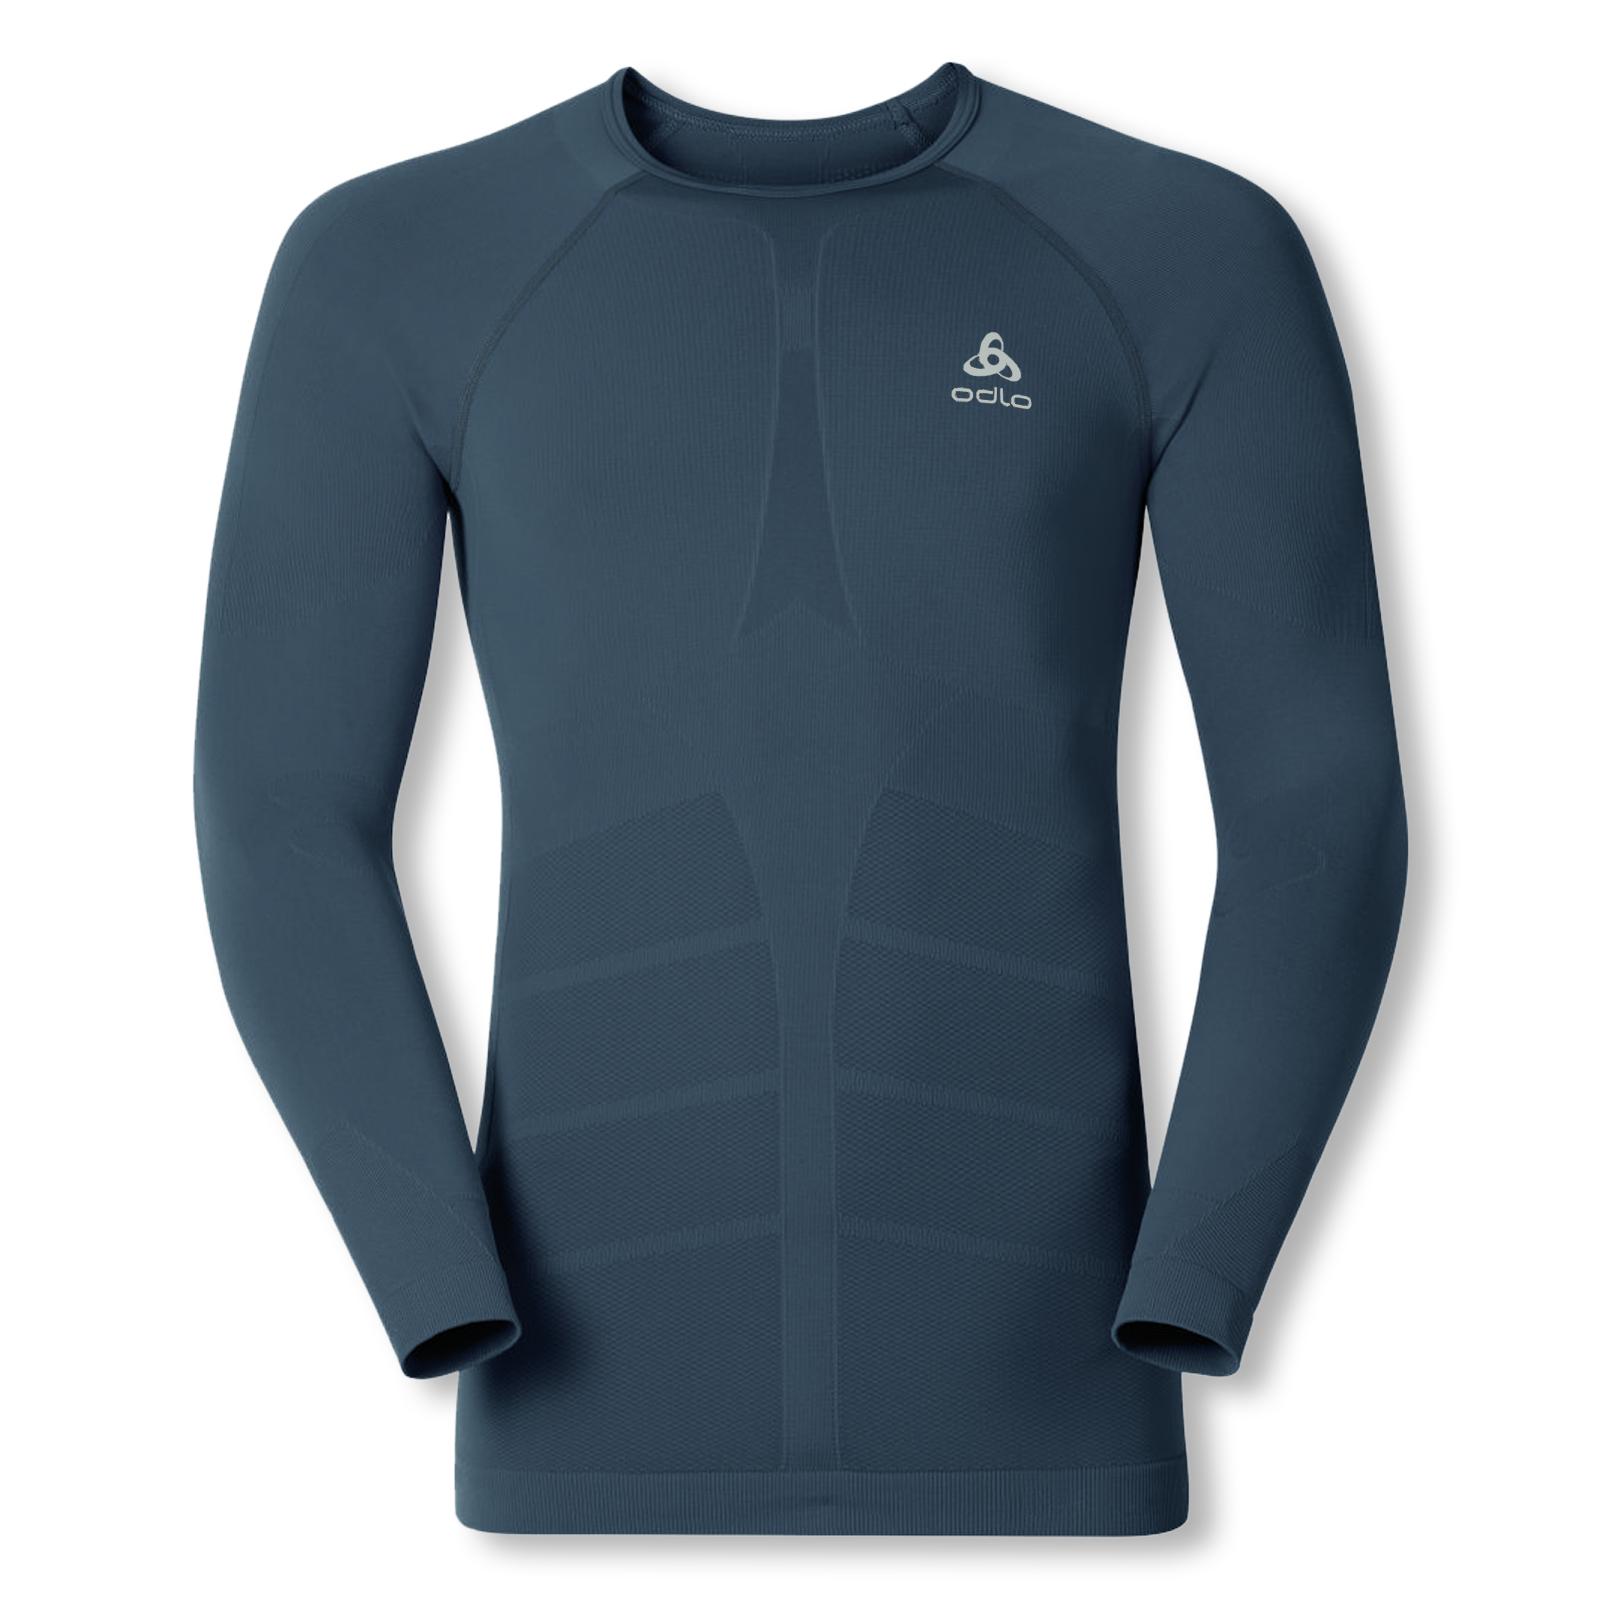 Odlo Herren Skiunterwäsche Funktionsshirt langarm WARM Shirt 192112 M L XL XXL in ombre blue